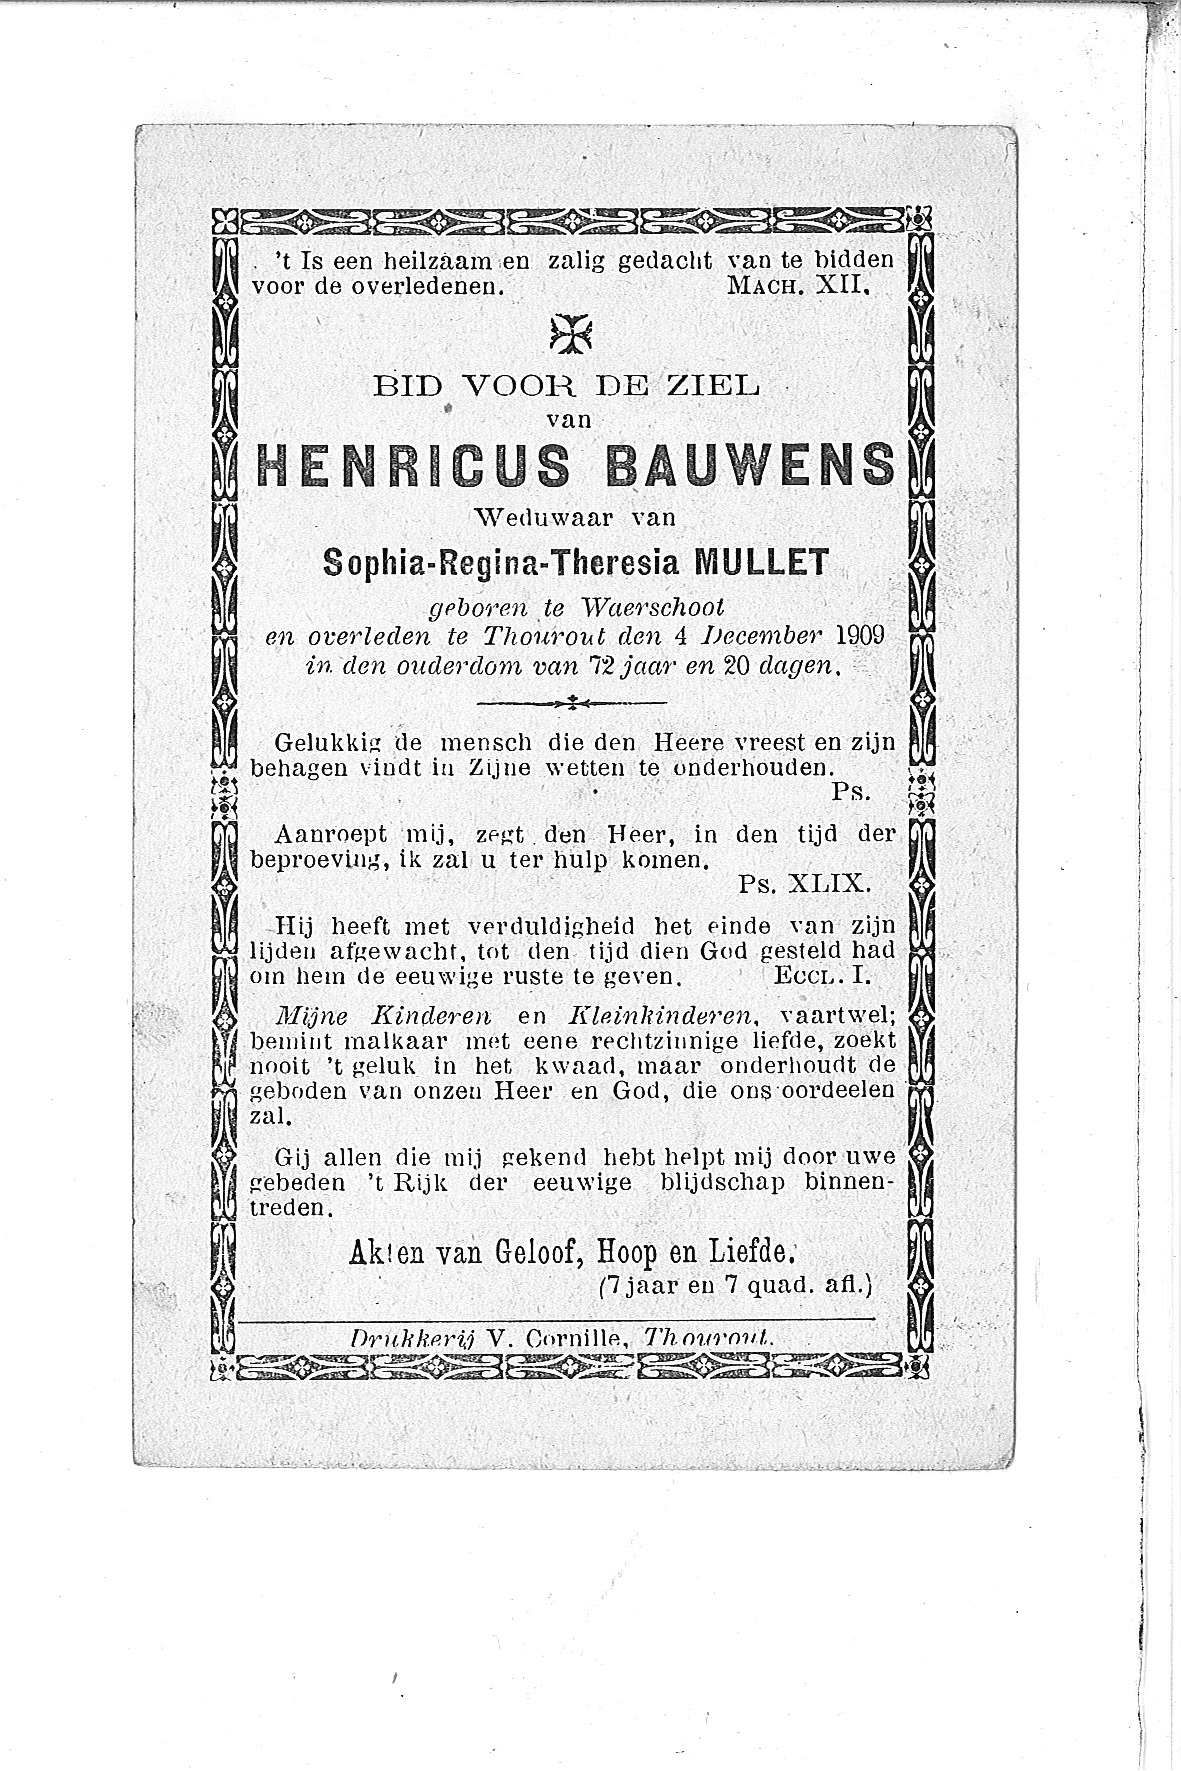 Henricus(1909)20101026144912_00007.jpg